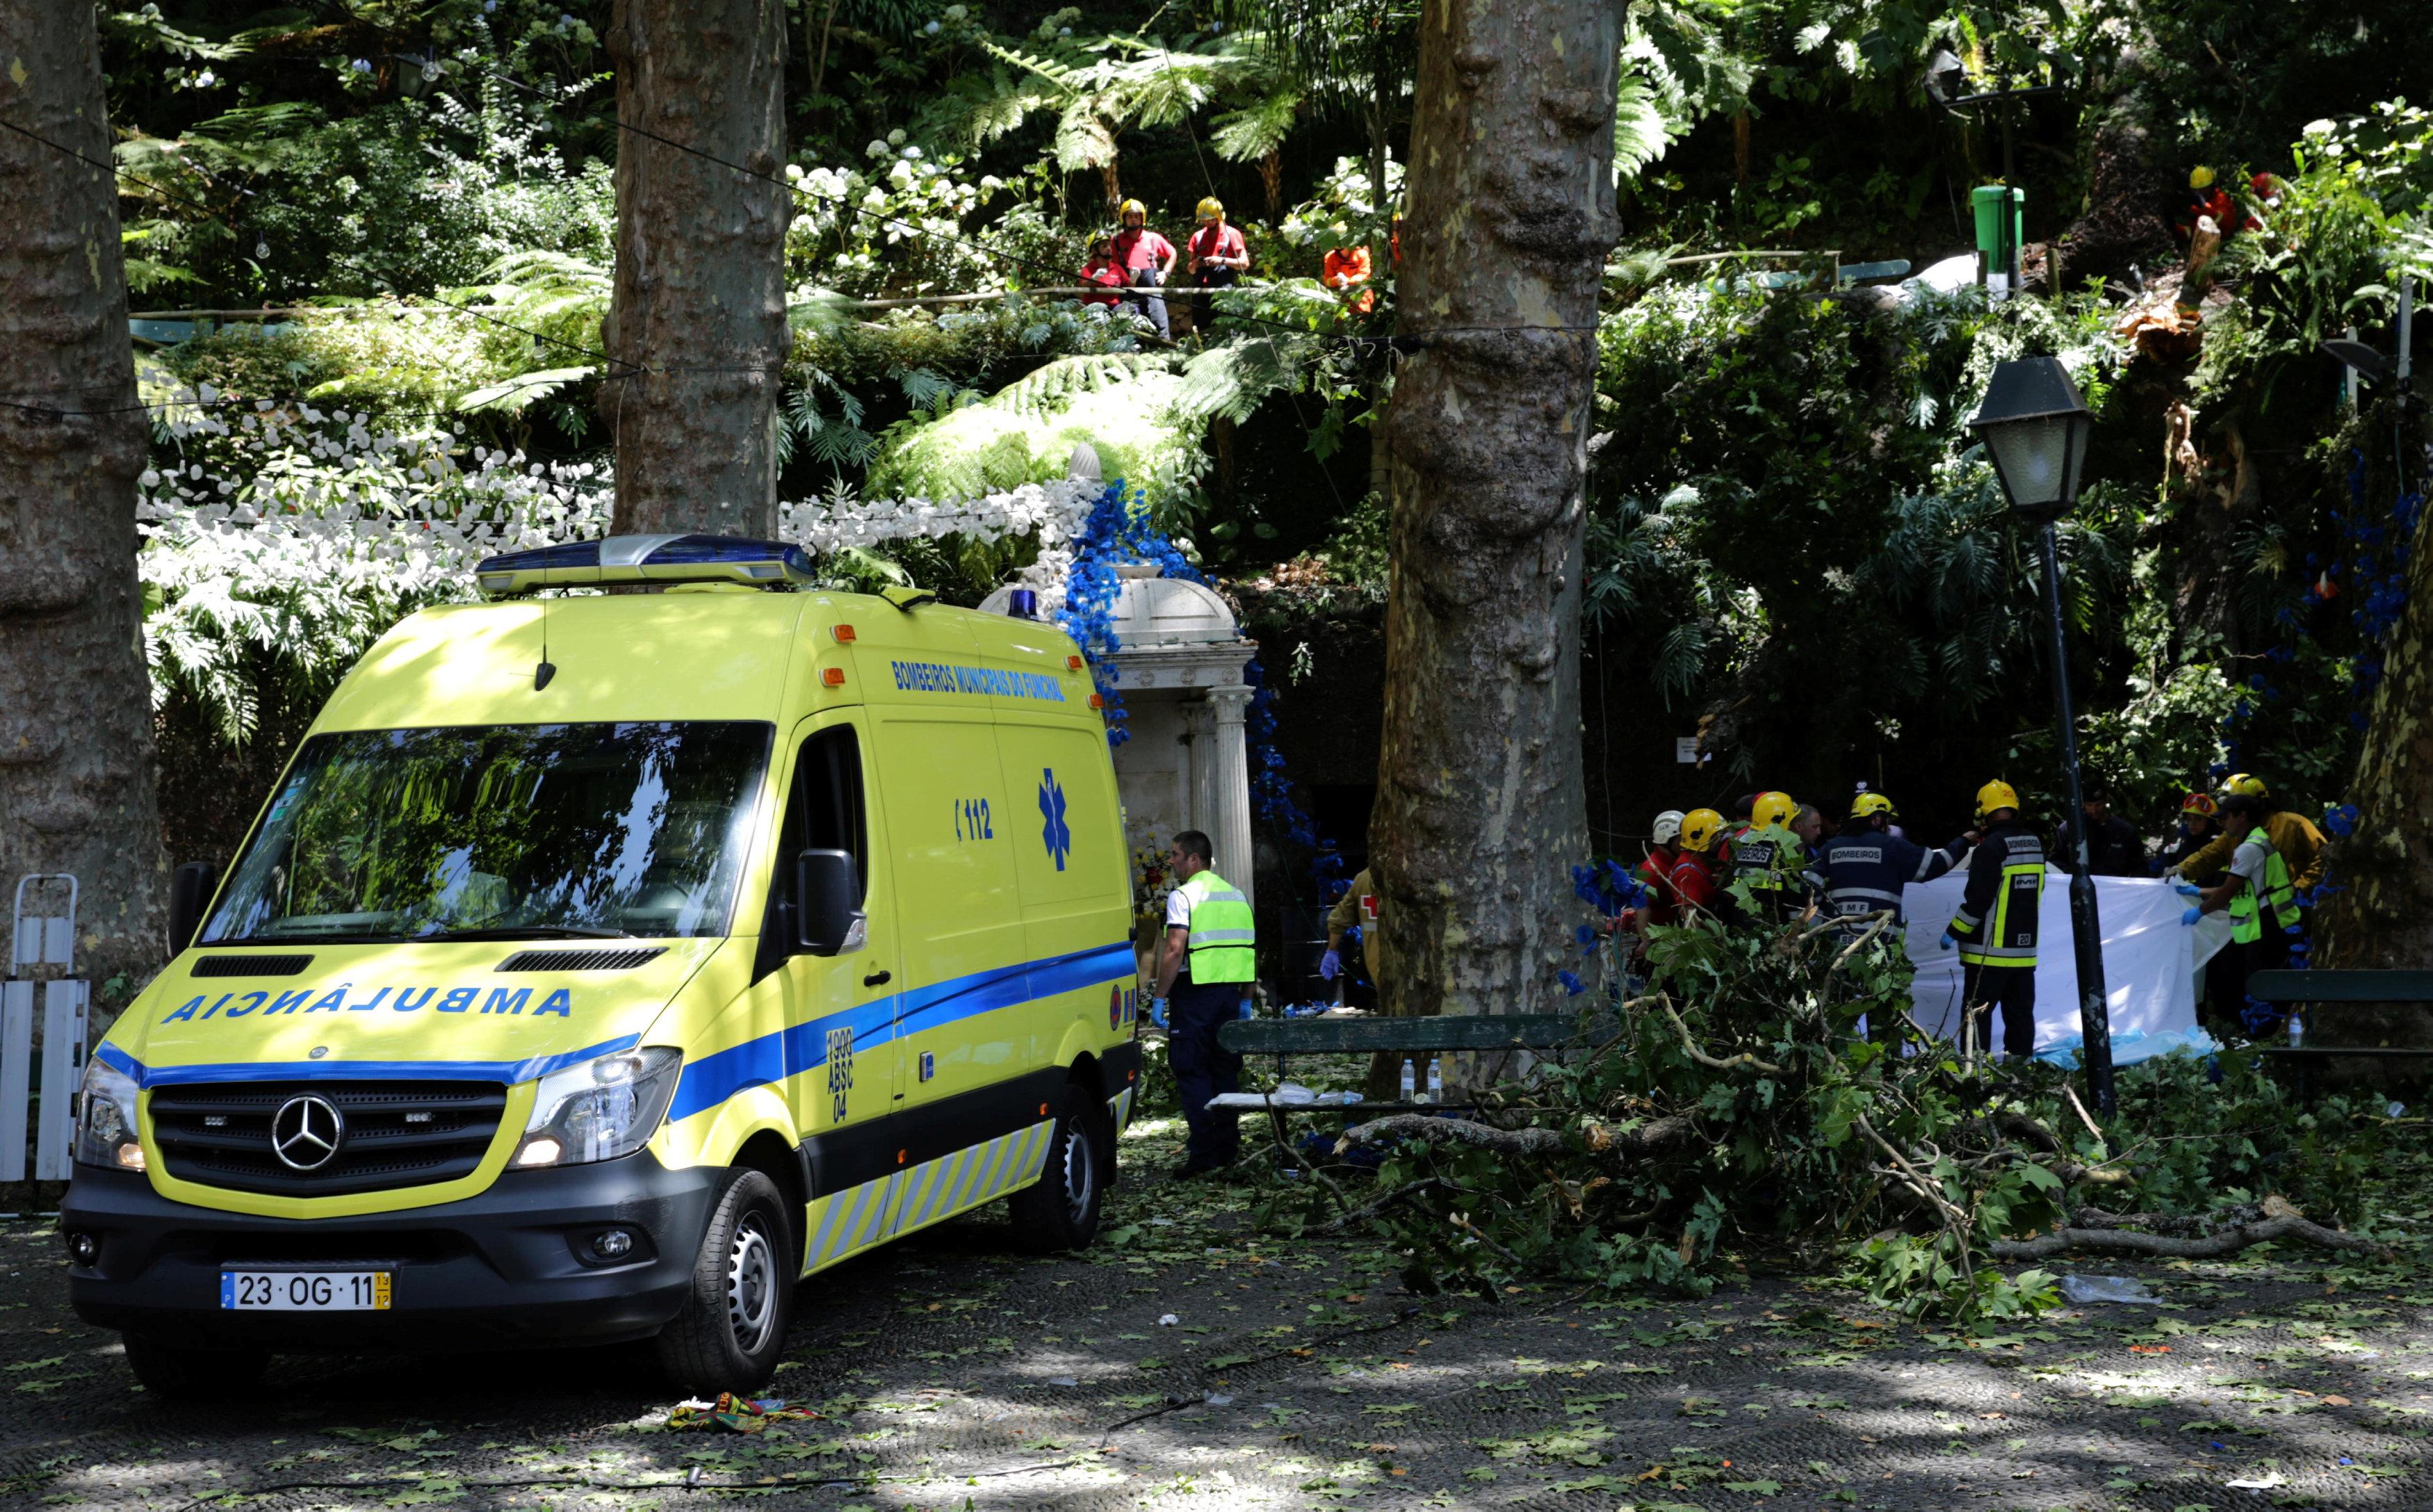 Falling tree kills 12 at Catholic festival in Portugal